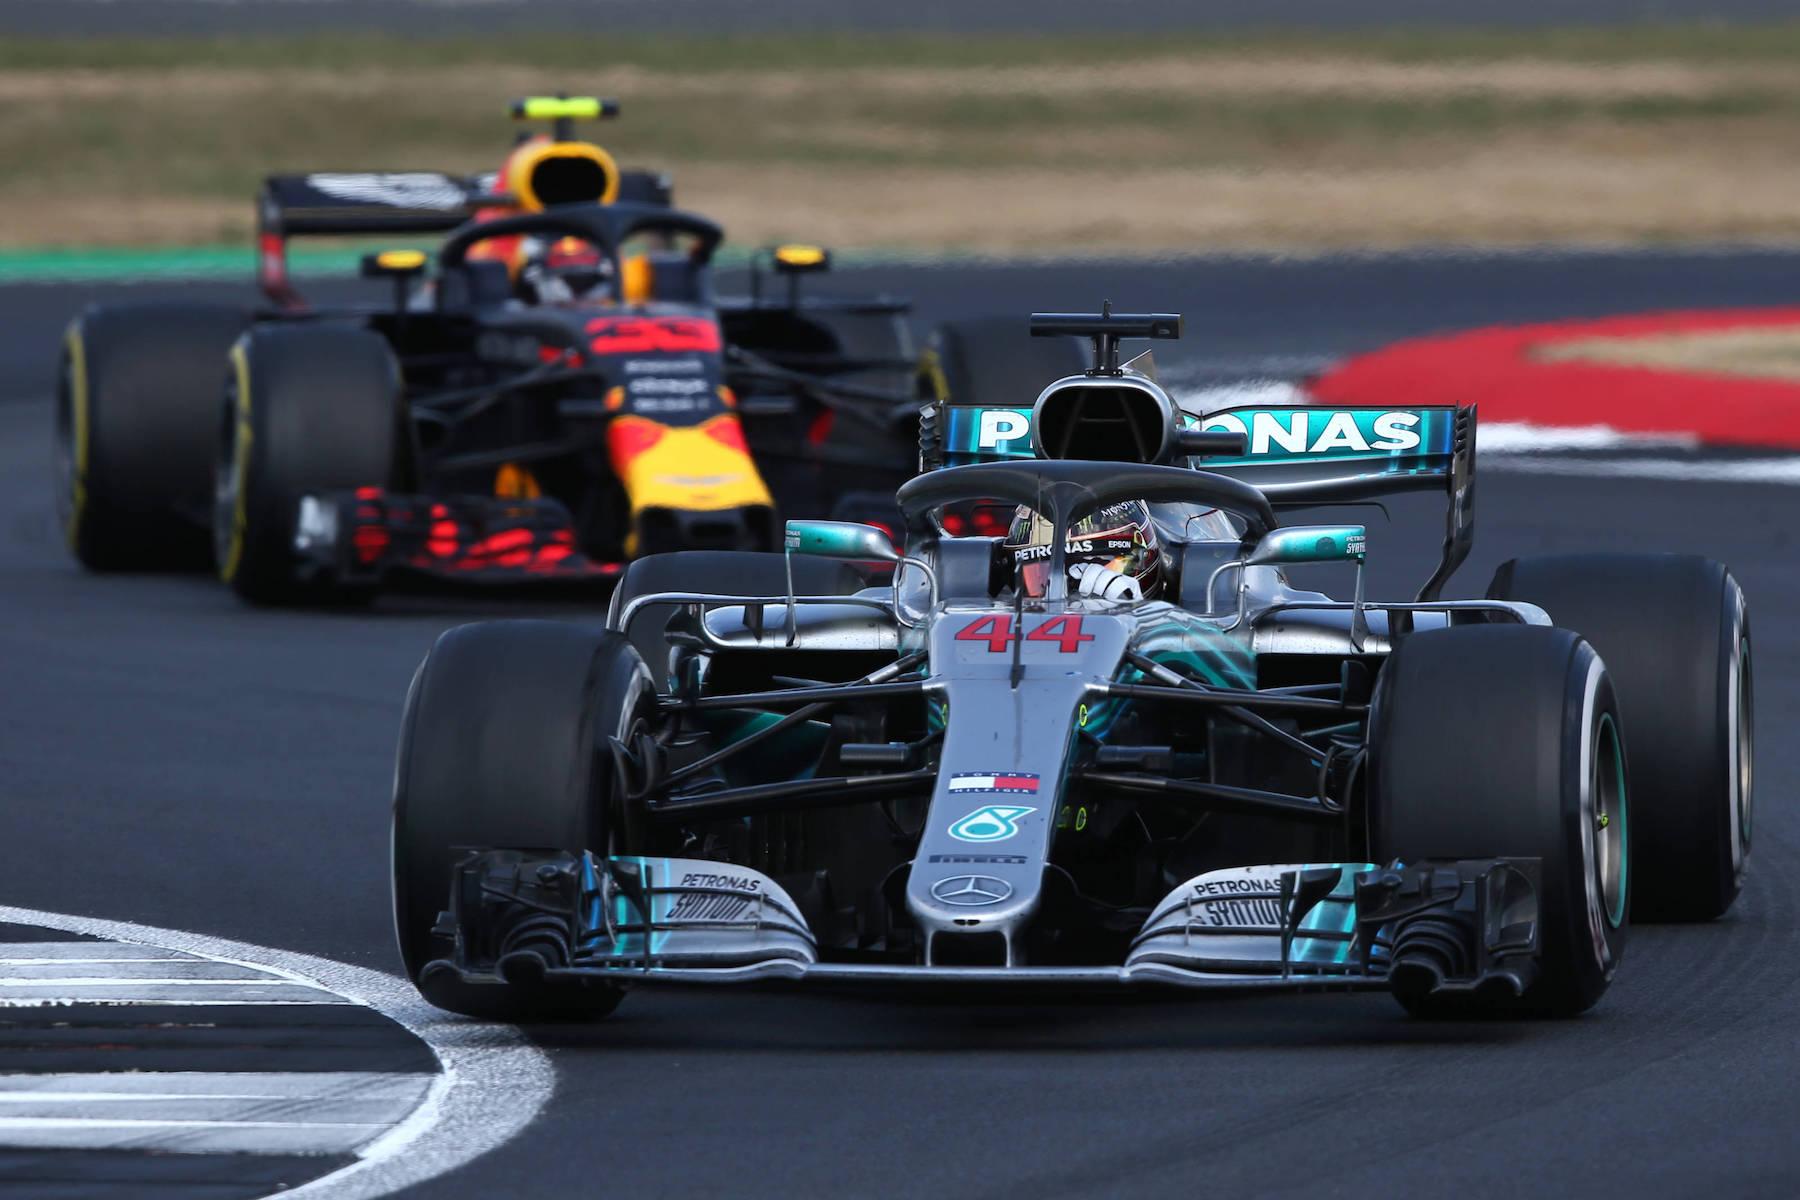 P 2018 Lewis Hamilton | Mercedes W09 | 2018 British GP P2 2 copy.jpg